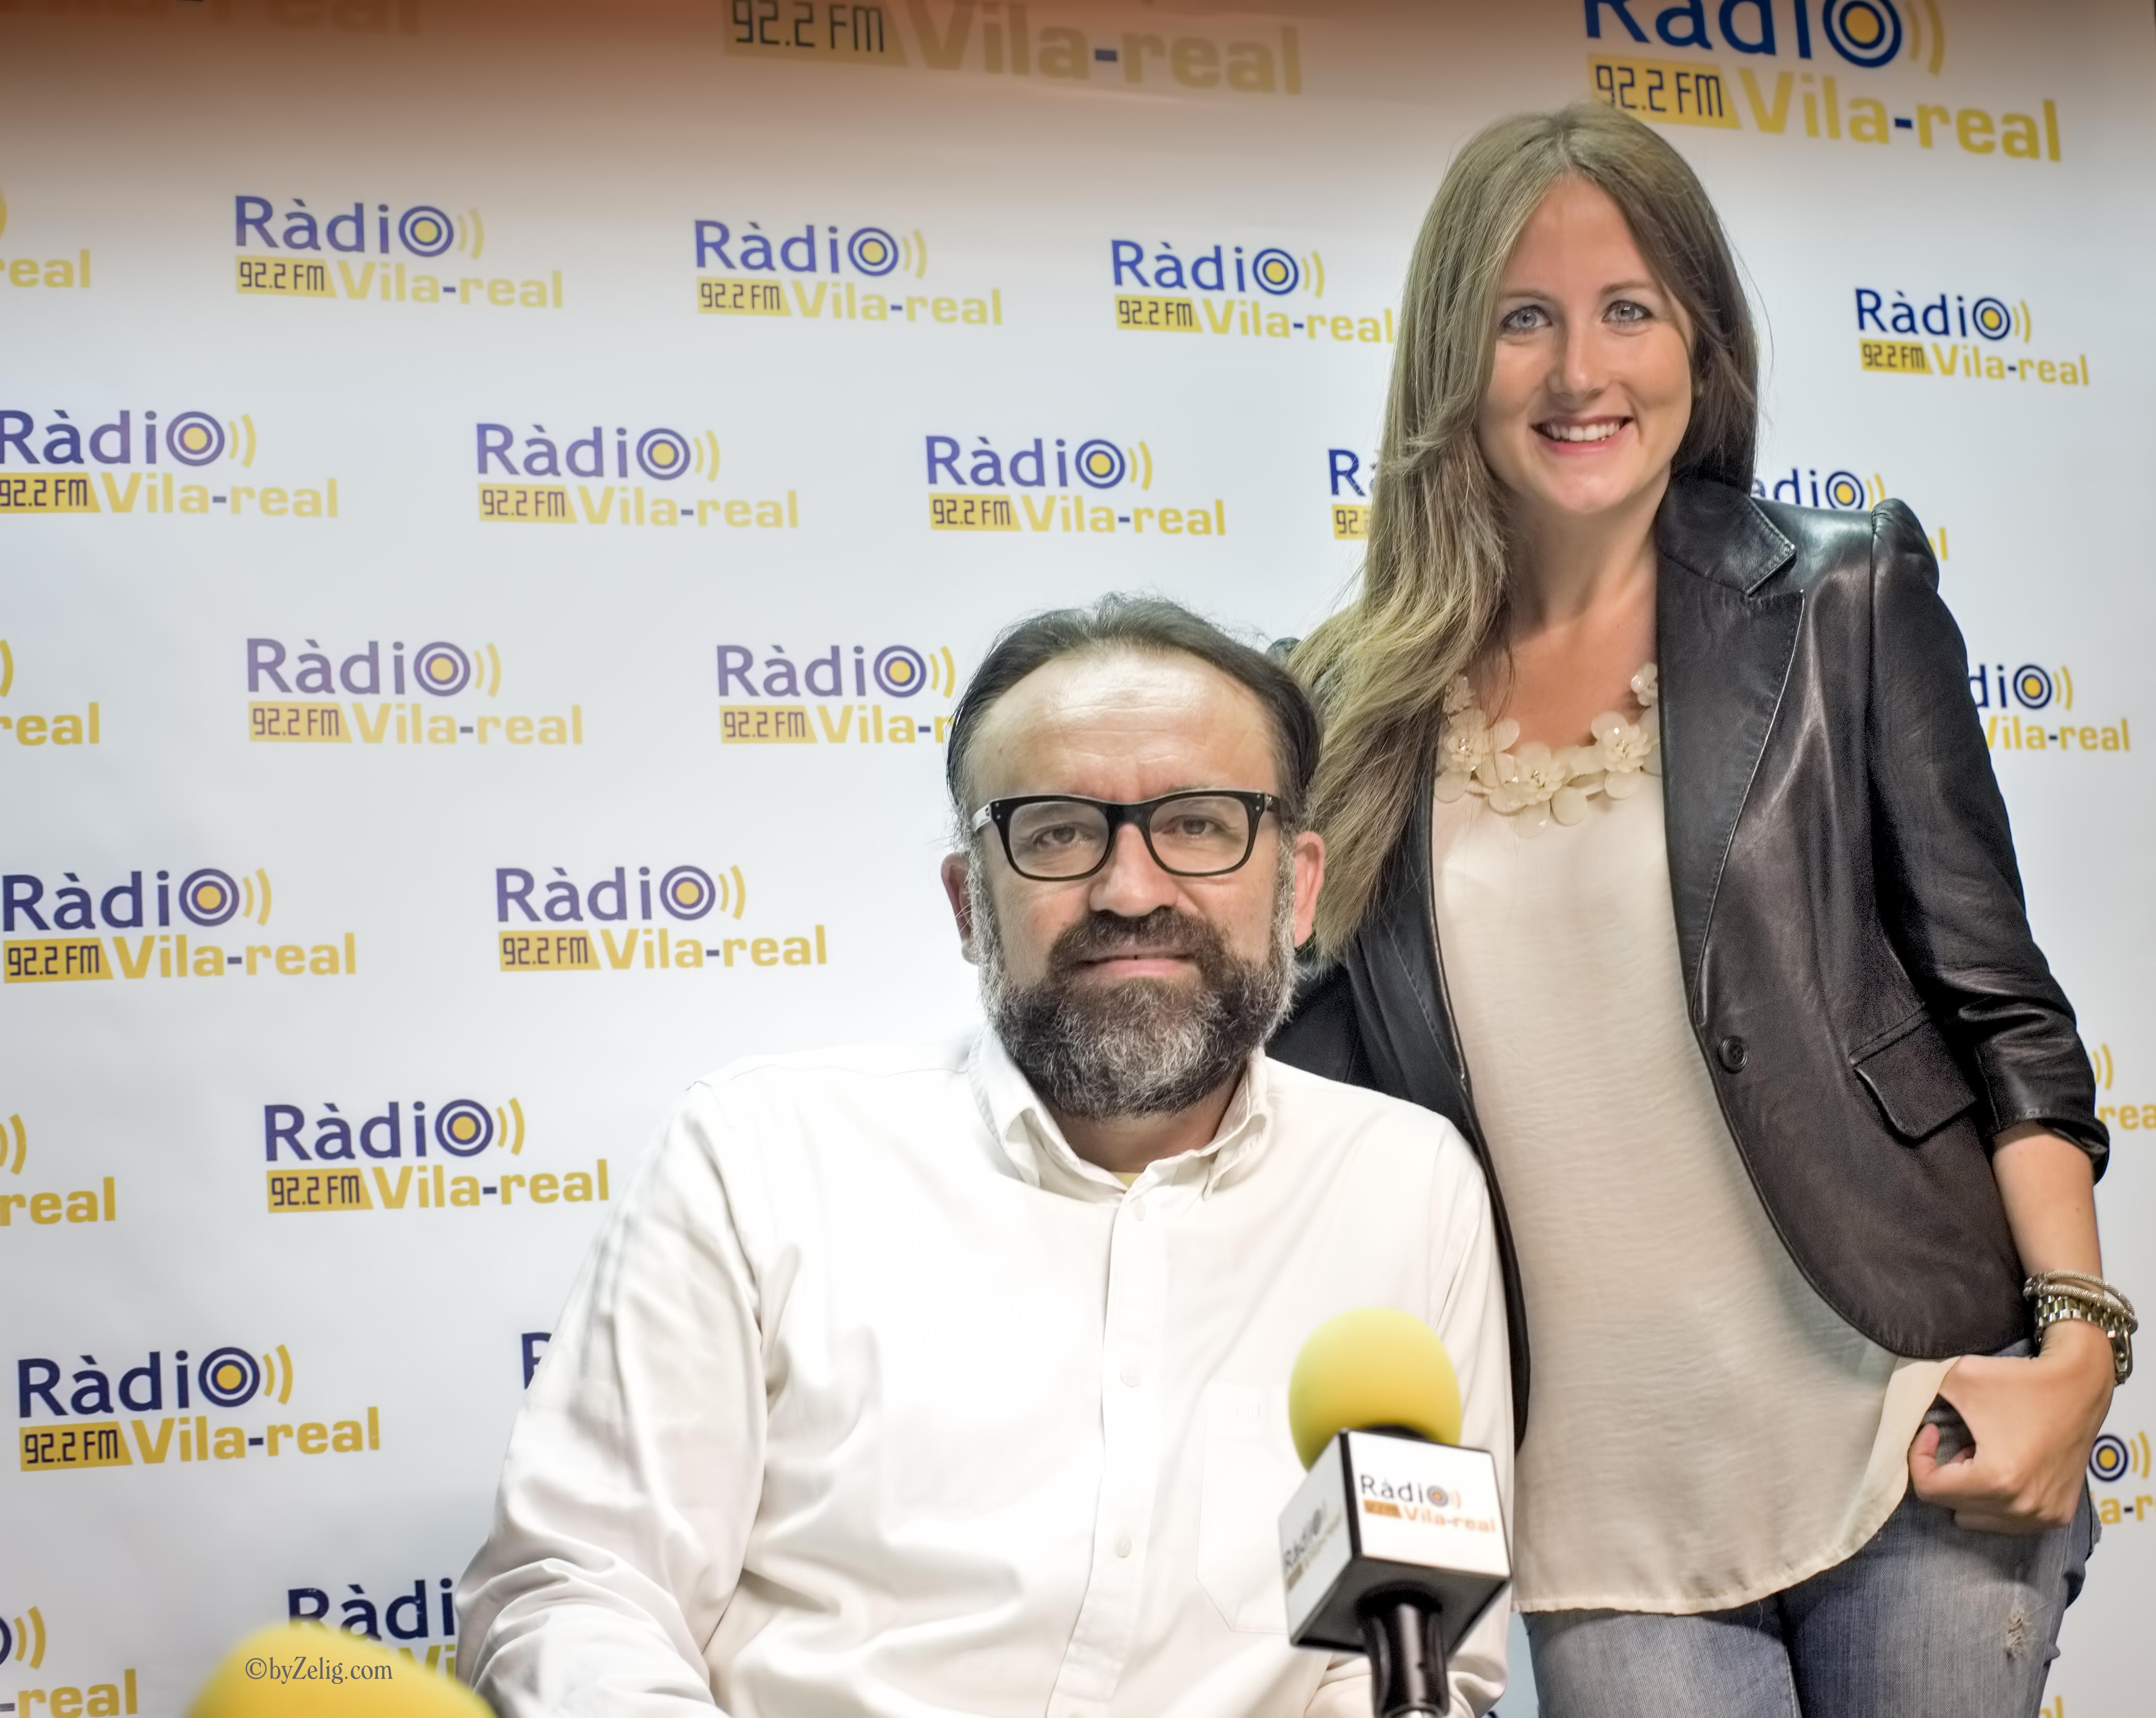 Esports Radio Vila-real. Programa del 17 de octubre 2017